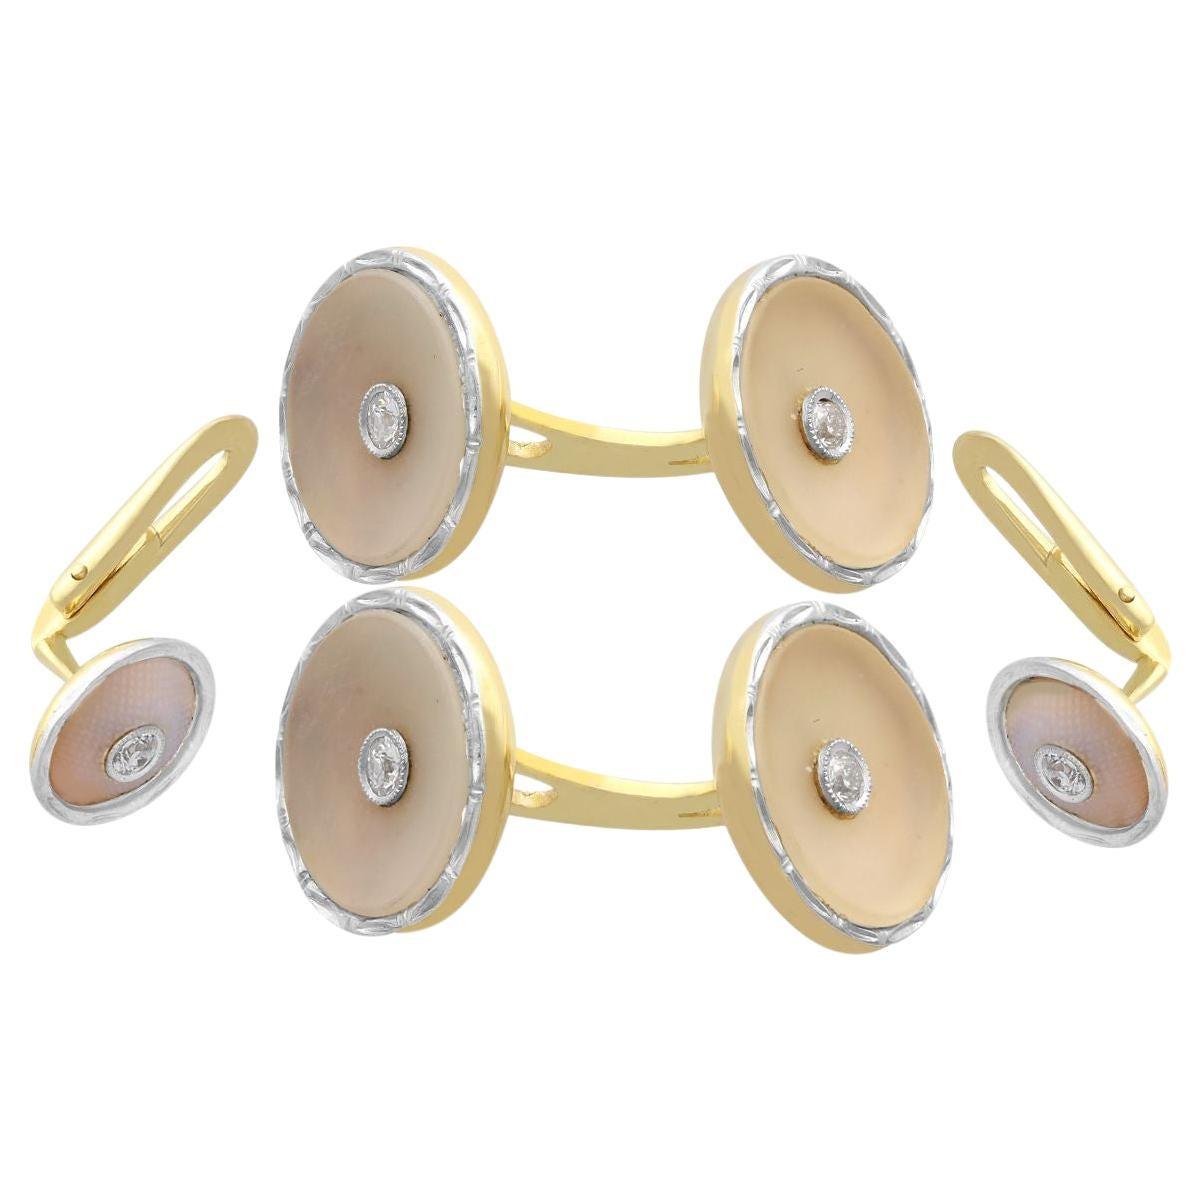 Diamond Crystal Yellow Gold and Platinum Cufflink and Stud Set